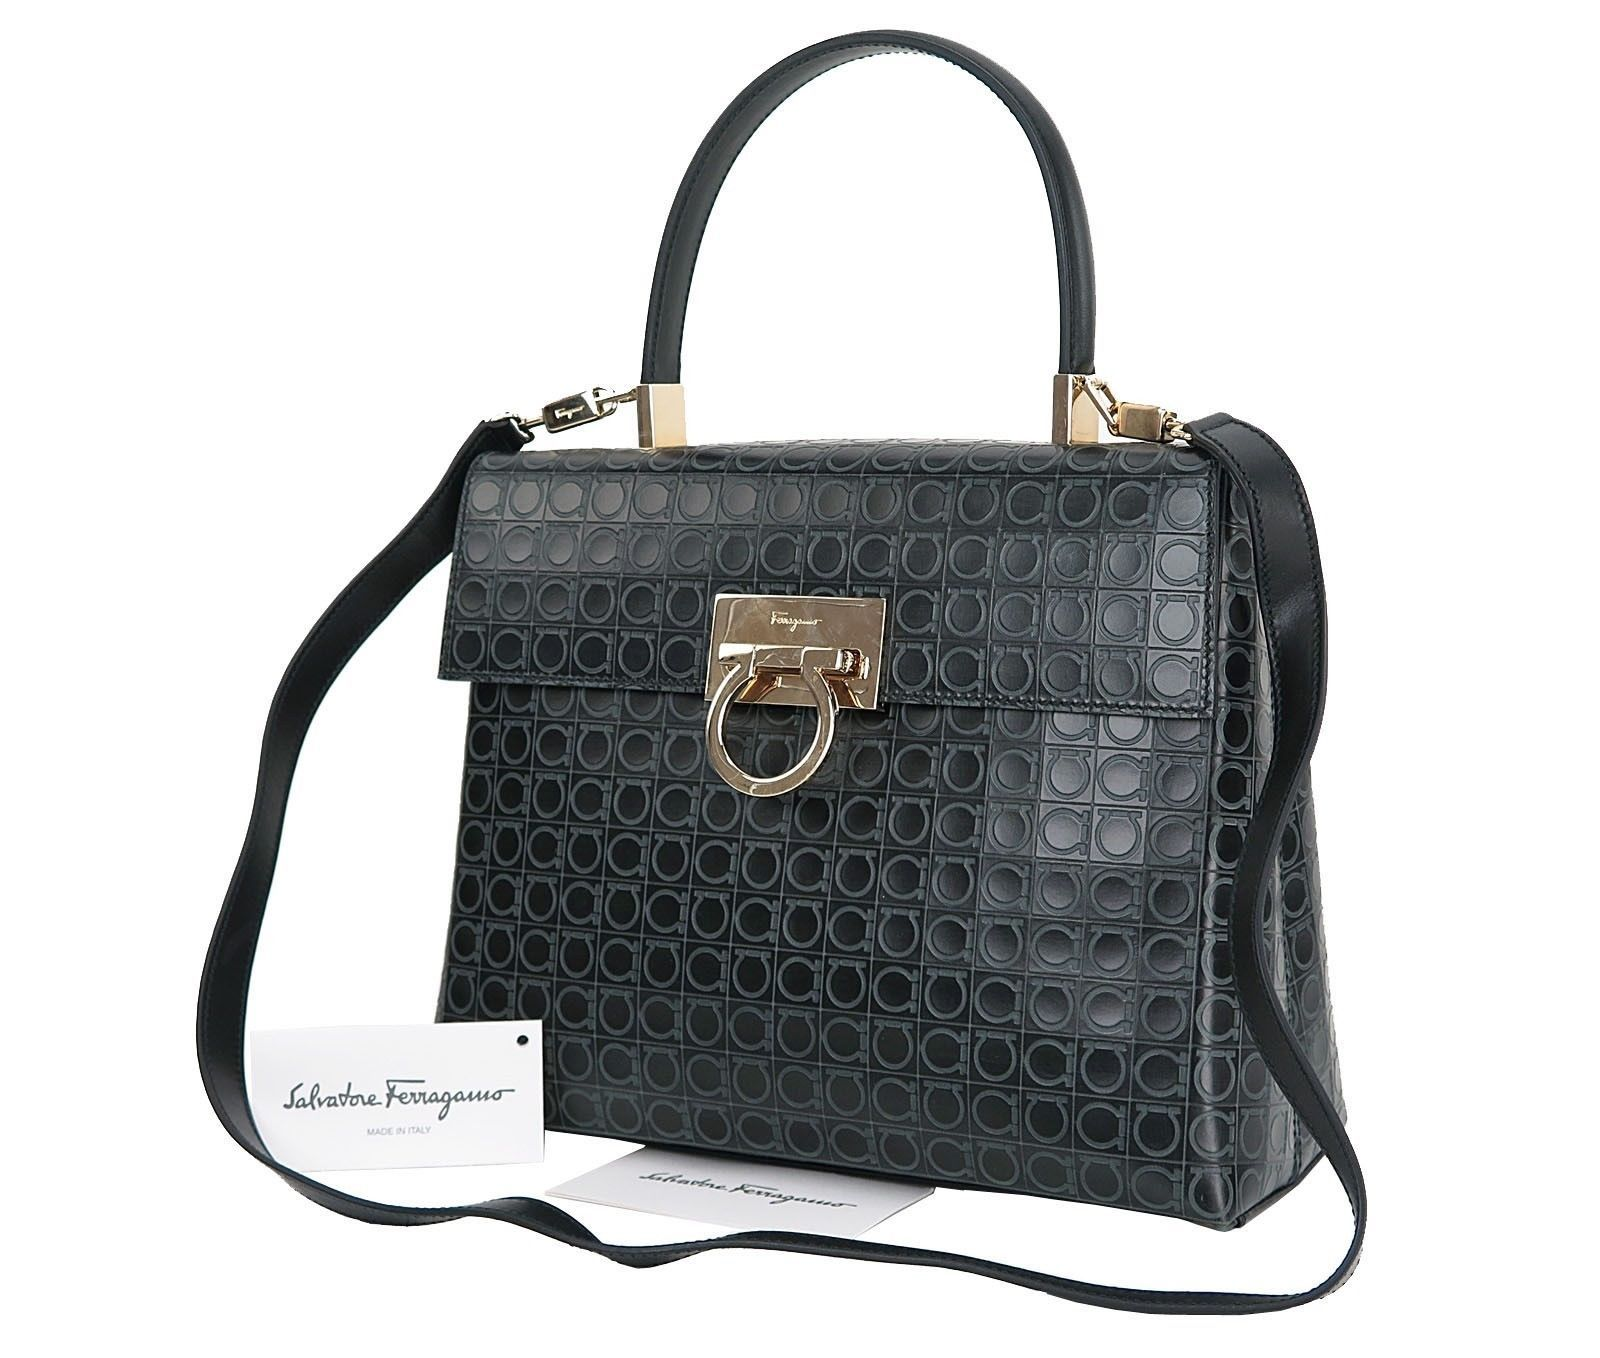 Auth SALVATORE FERRAGAMO Gancini Black Leather 2-Way Shoulder Hand Bag   26180 dd53143ad537d